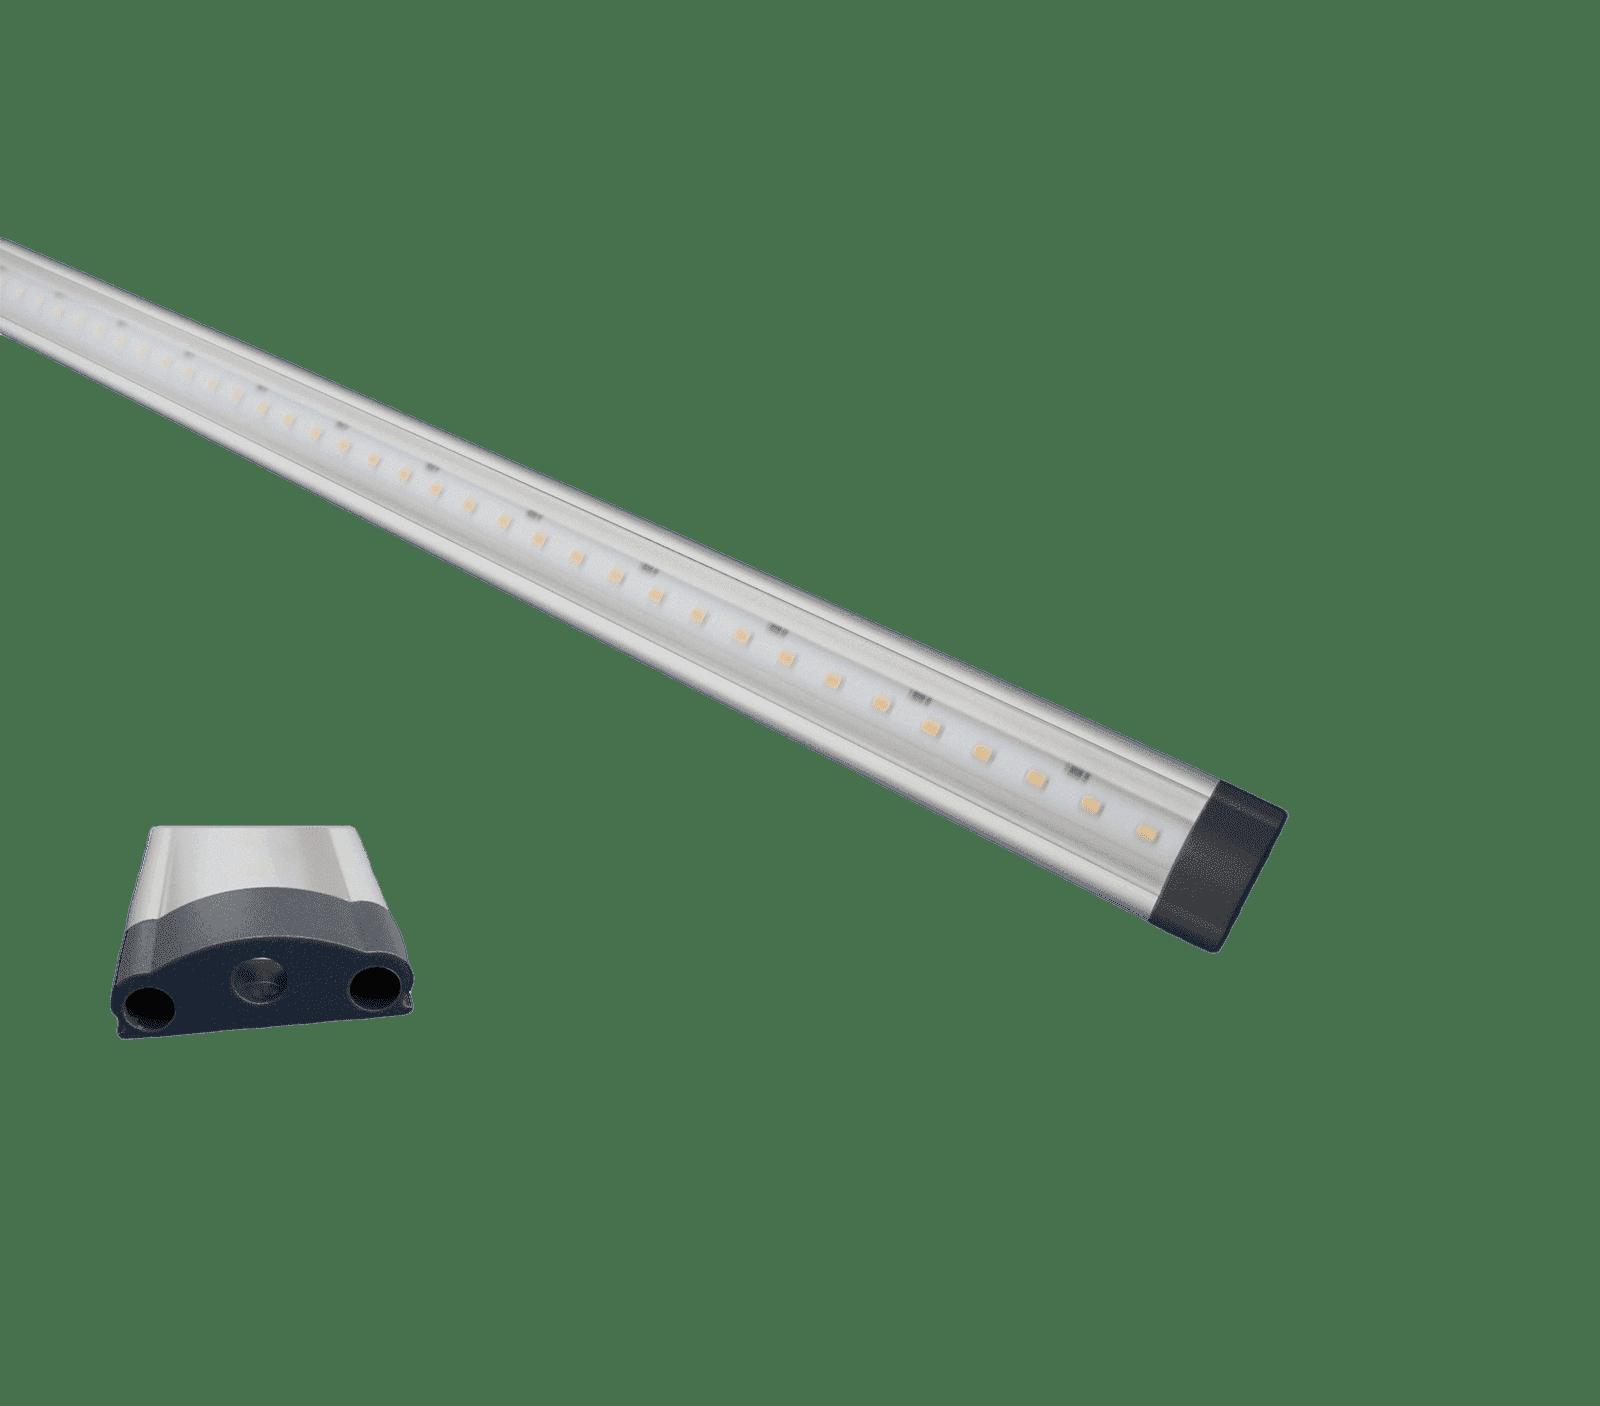 Ledstrip 50cm 12v 5,5w ap-touch